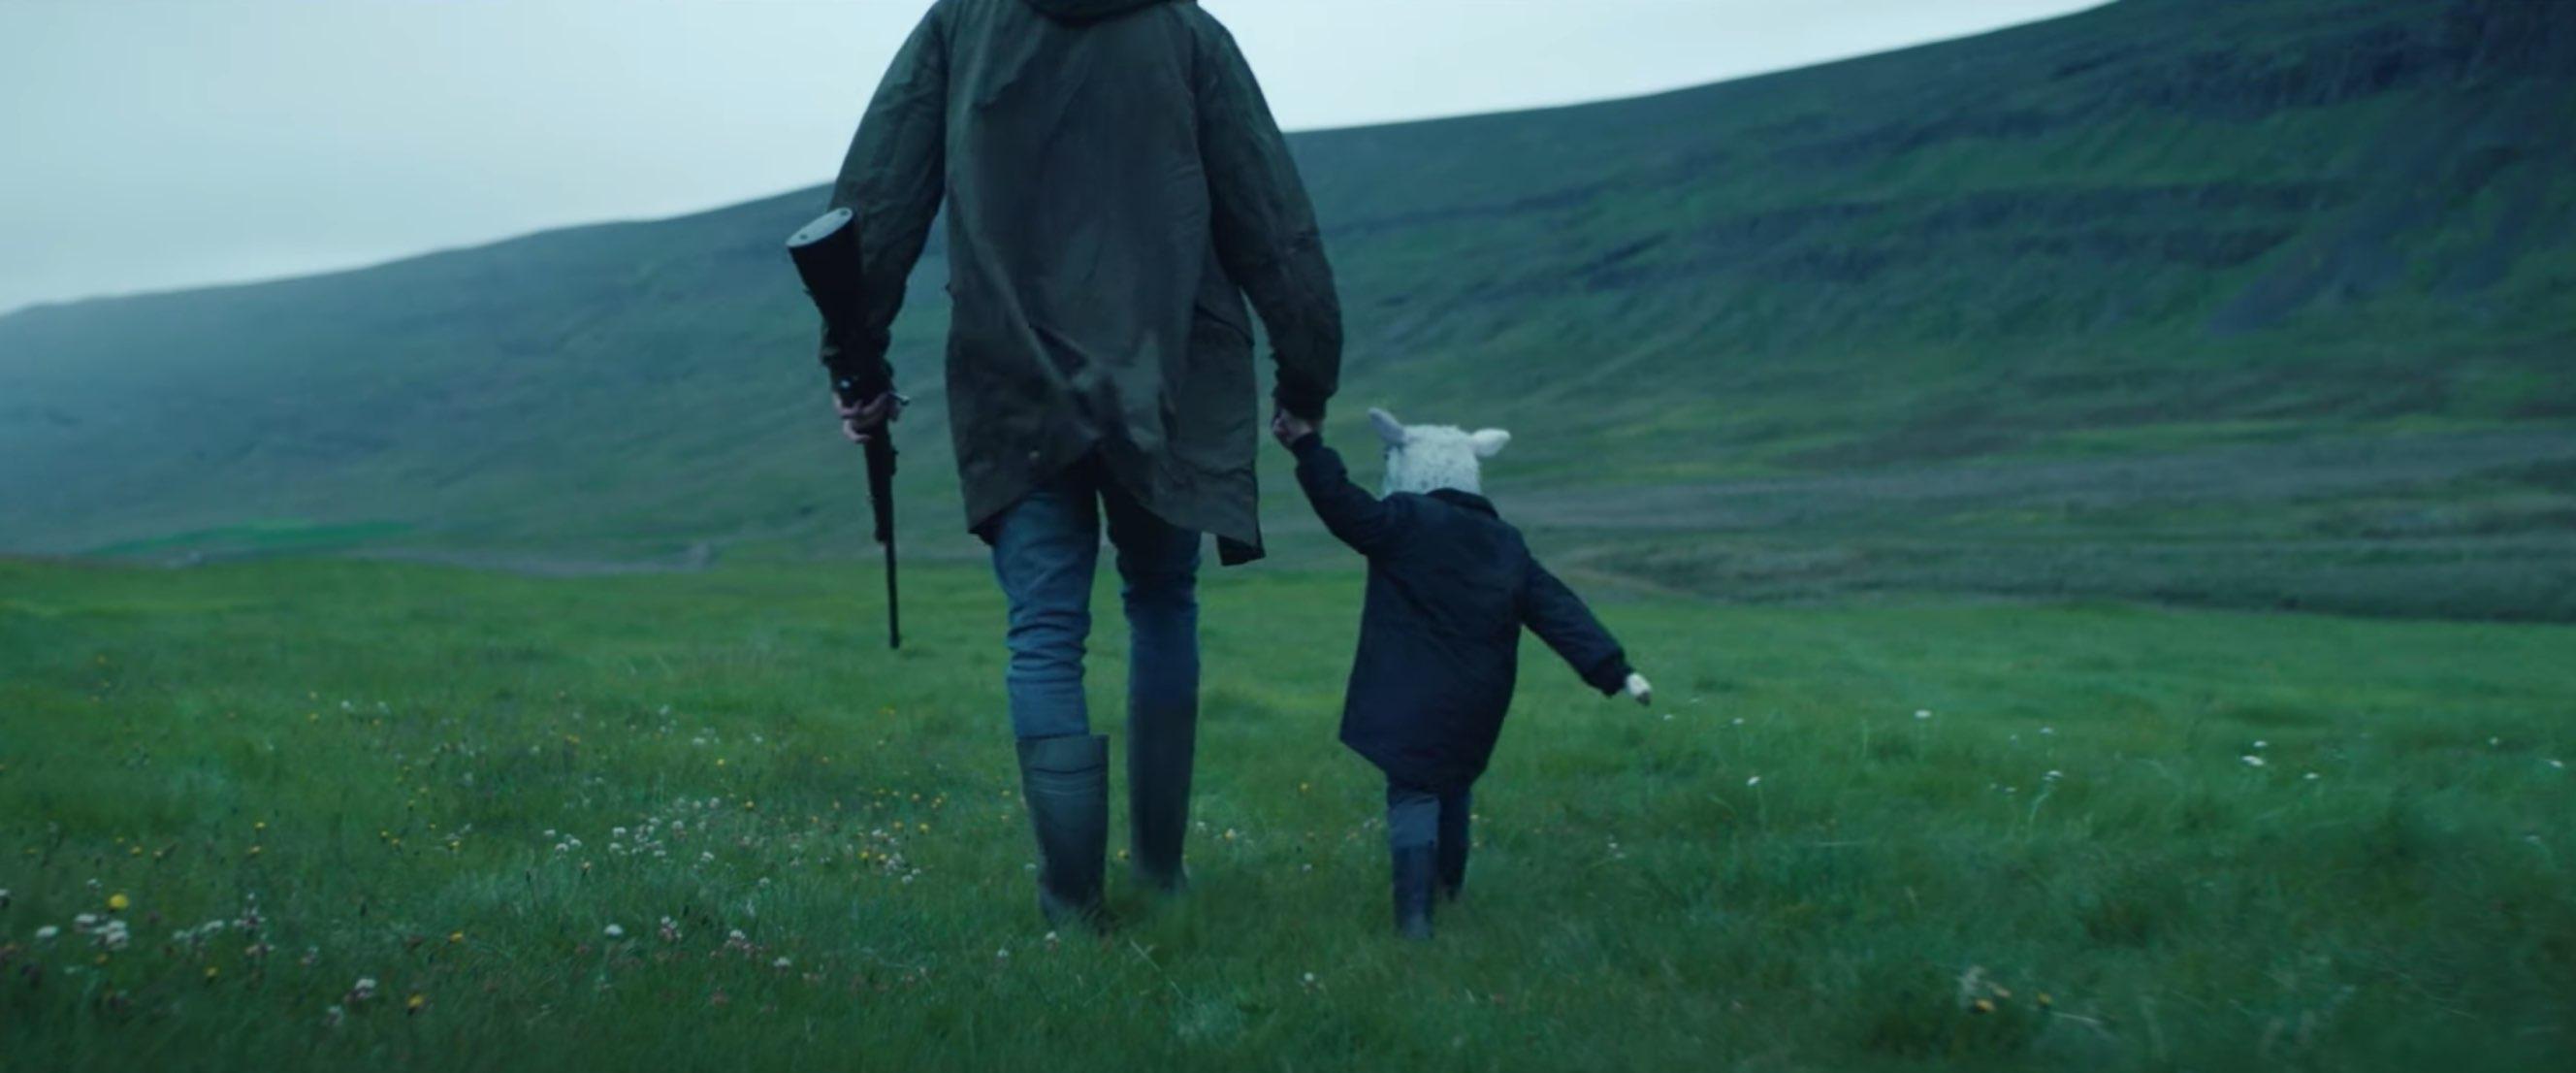 Lamb' Trailer Reveals Half-Lamb, Half-Human Baby - Variety